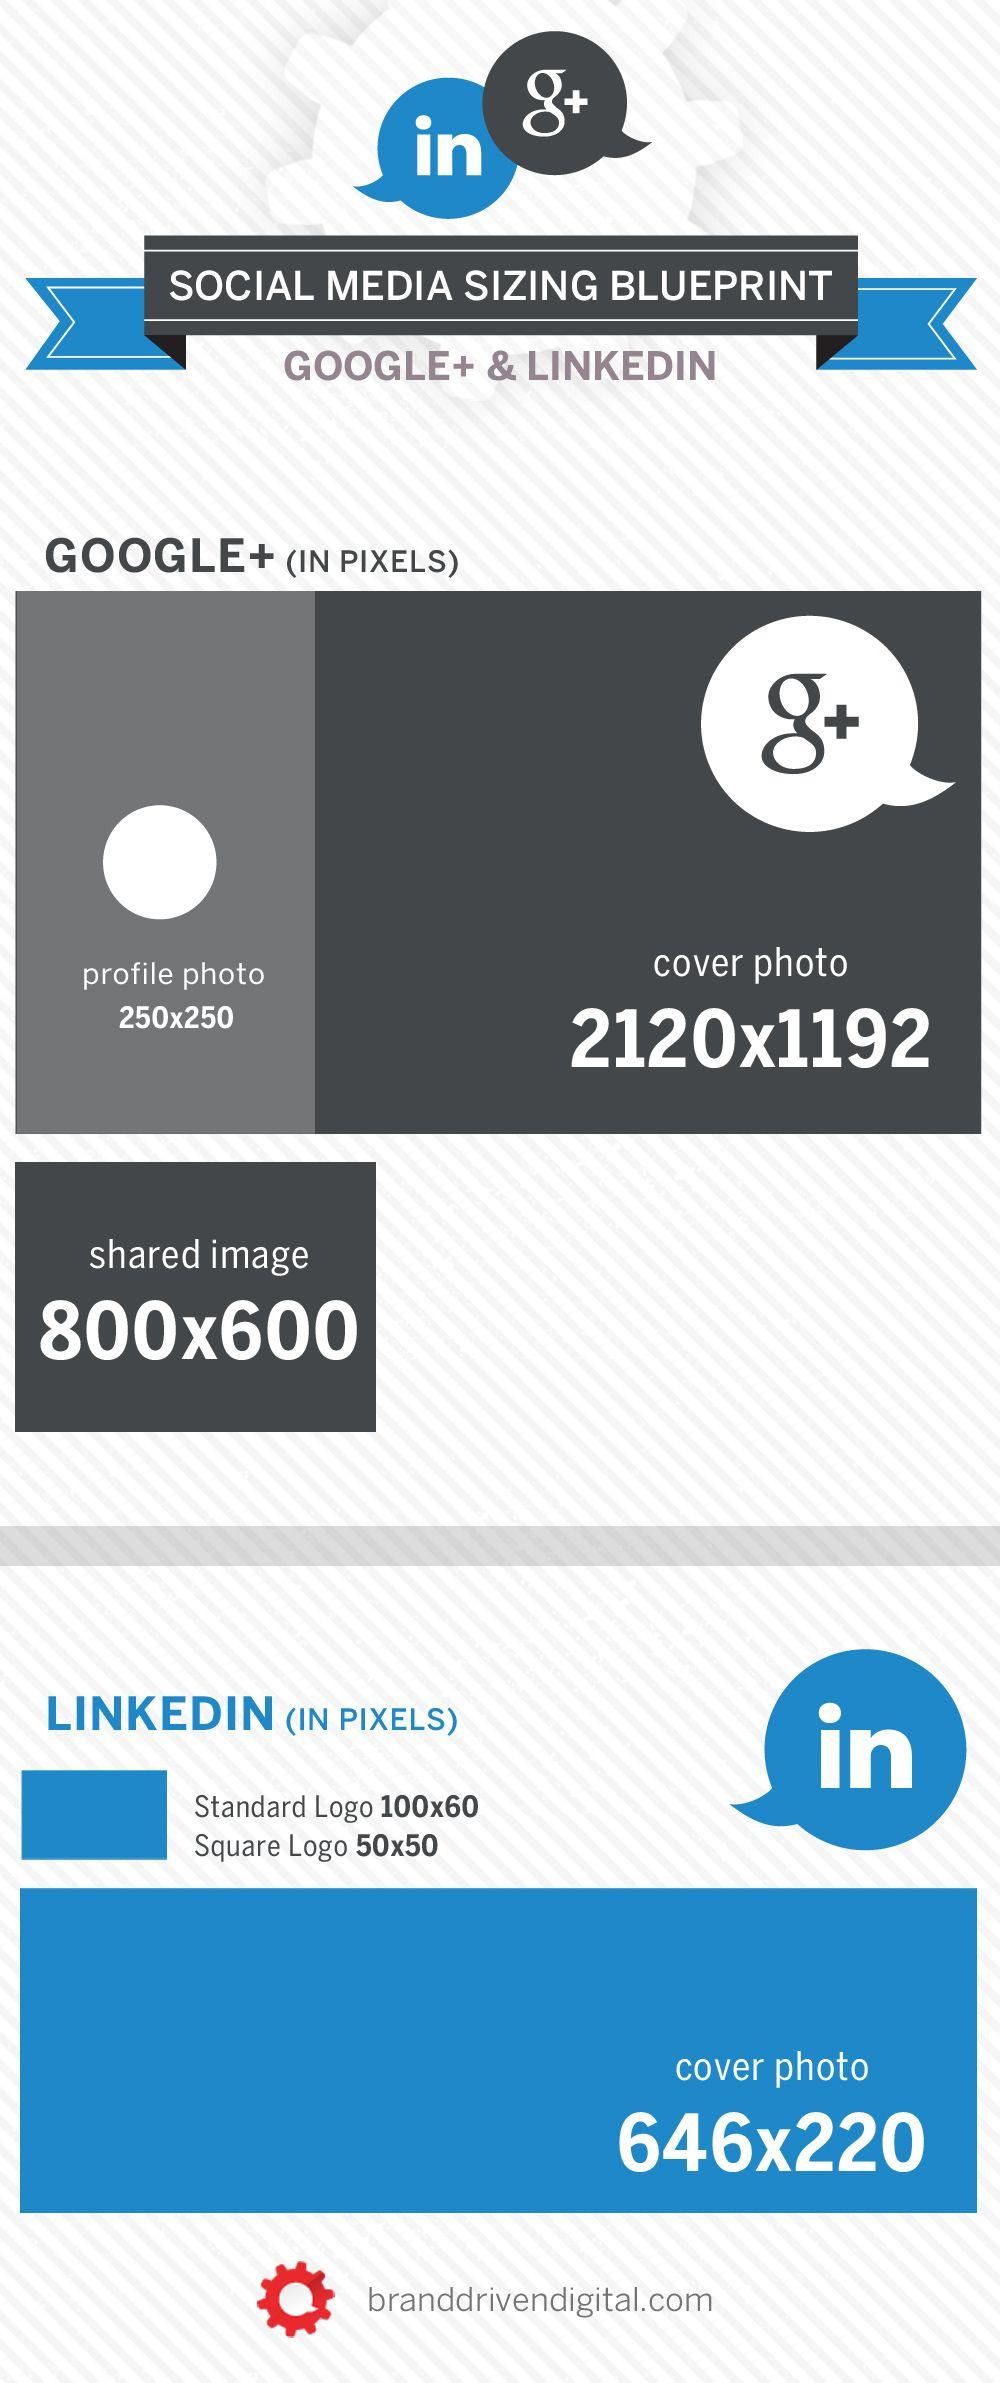 Social media image size blueprint google and linkedin educate social media image size blueprint google and linkedin malvernweather Gallery